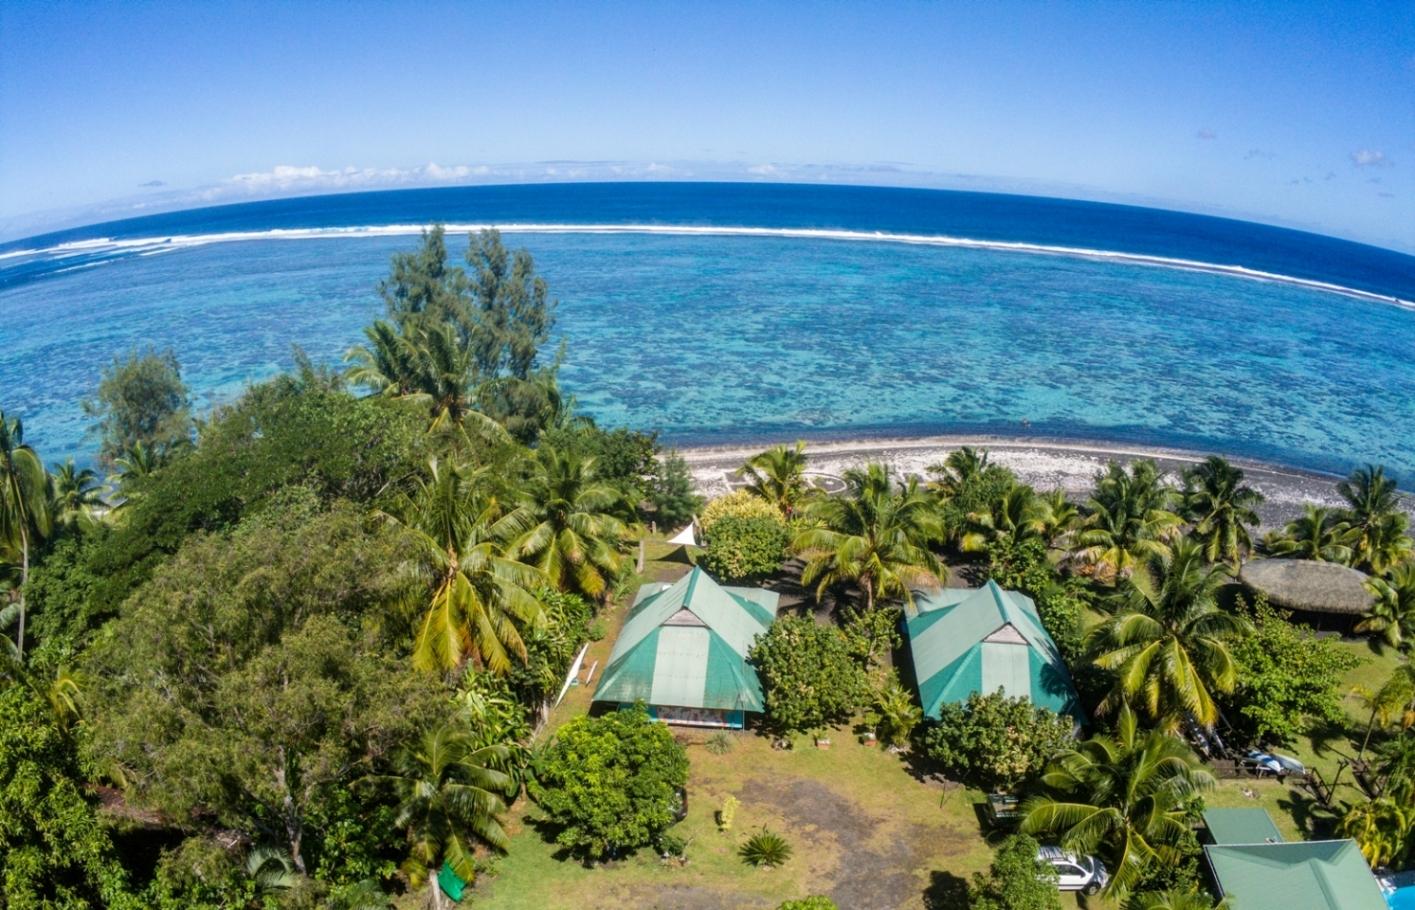 https://tahititourisme.com/wp-content/uploads/2019/08/copie-Tahiti-tourisme-948ko.jpg